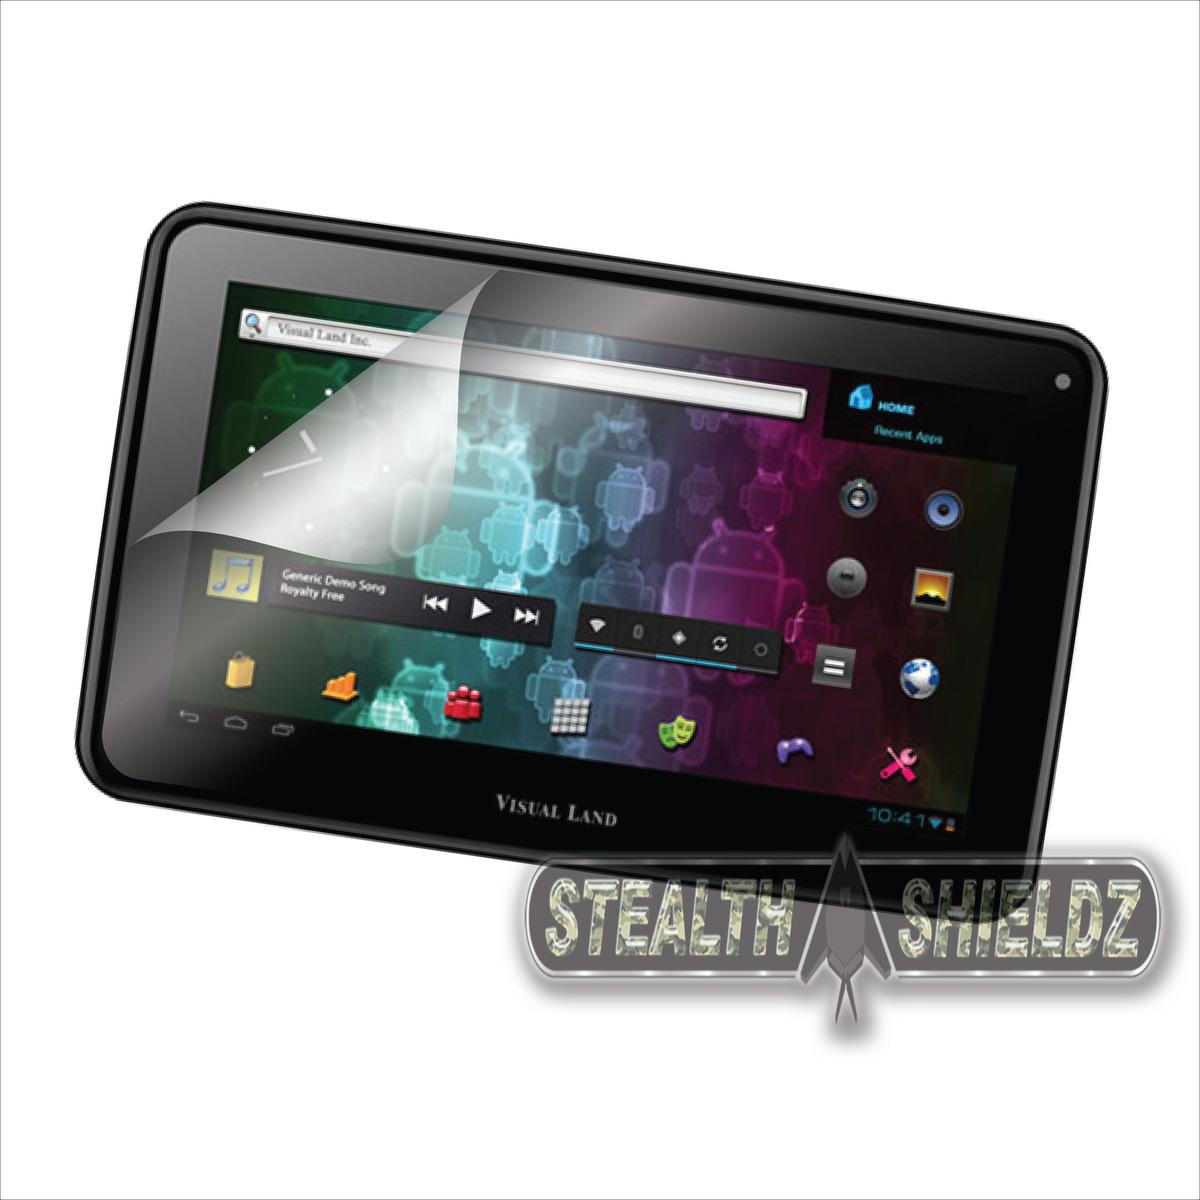 2 Pack s Shieldz Screen Protector for Visual Land Prestige 7L Internet Tablet